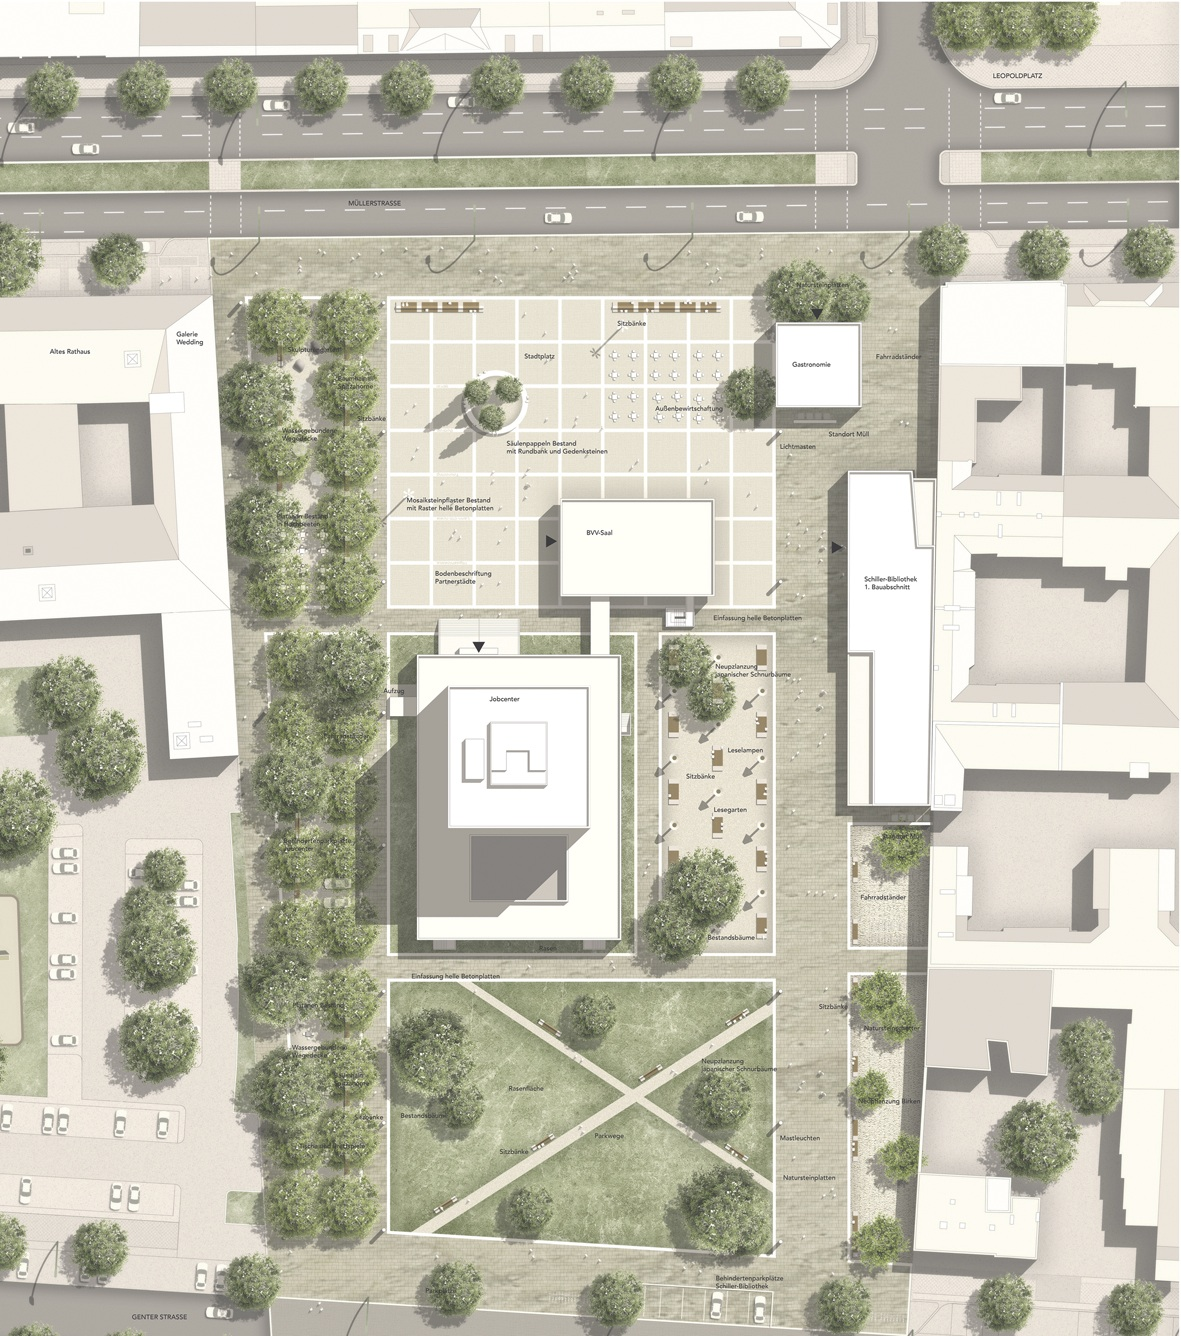 Planung Rathaus-Umfeld